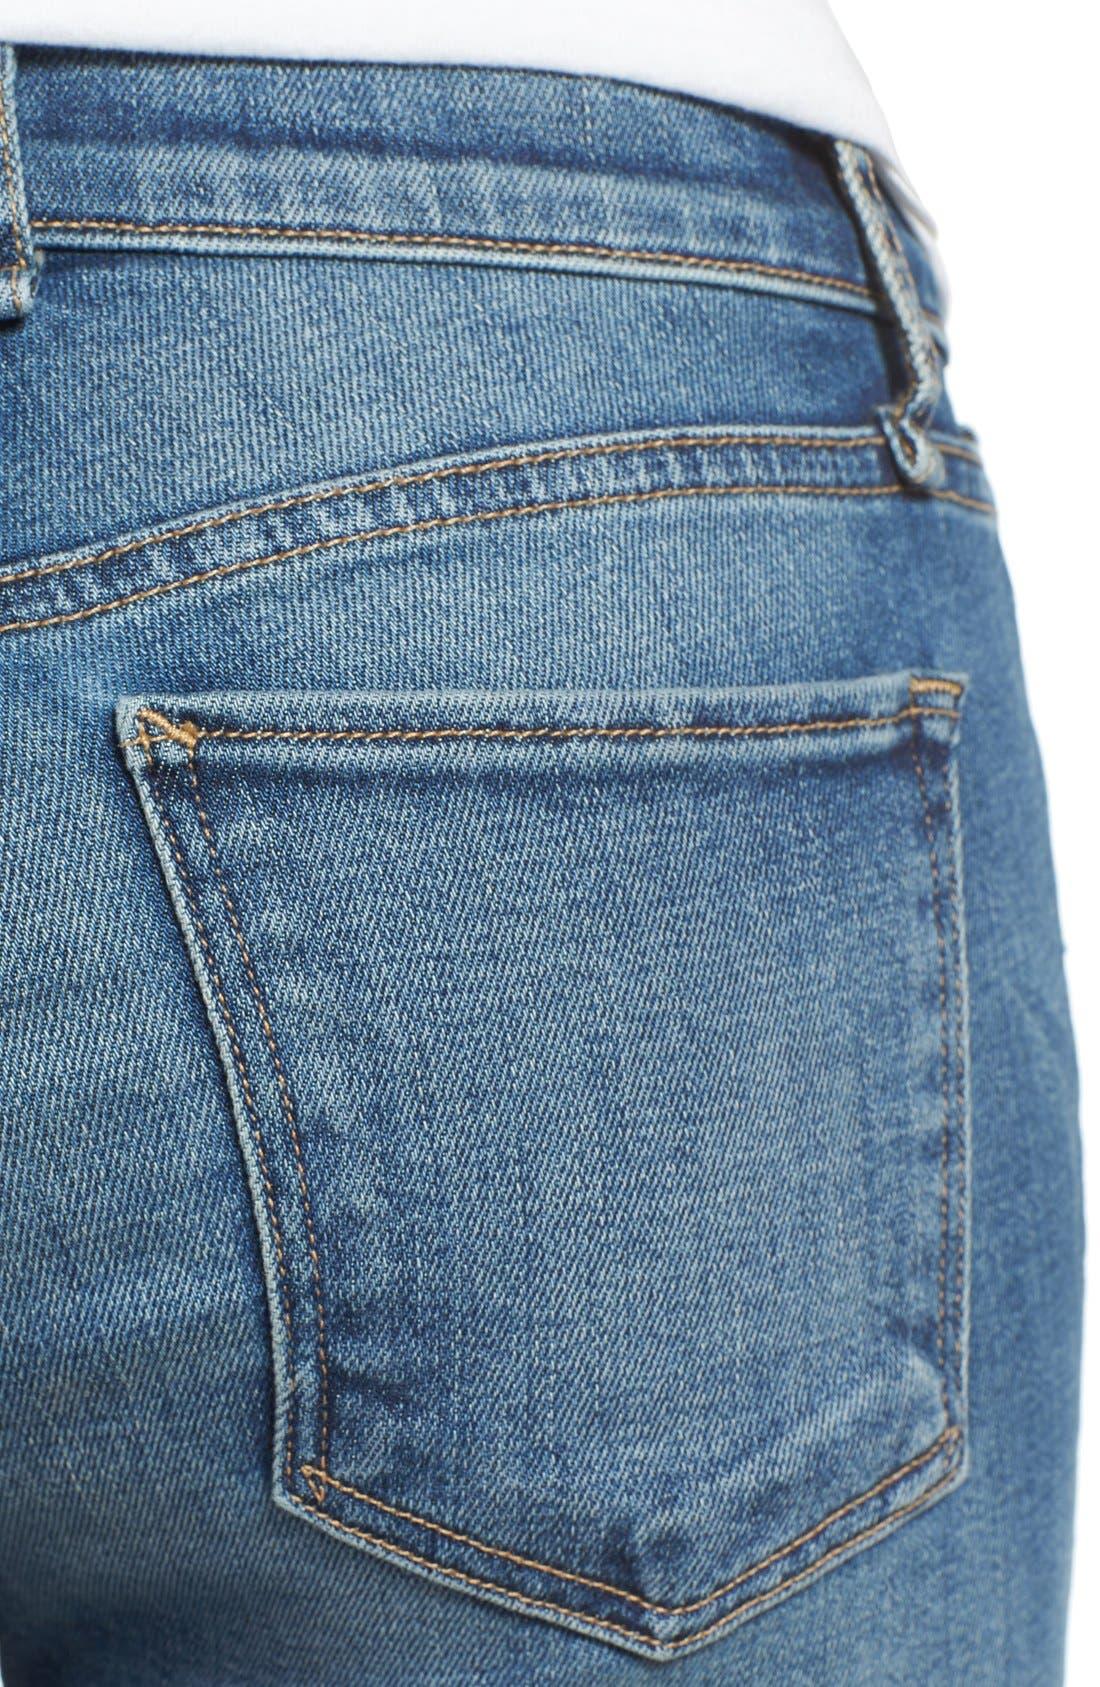 Alternate Image 4  - McGuire 'Newton' Released Hem Crop Skinny Jeans (Iona)